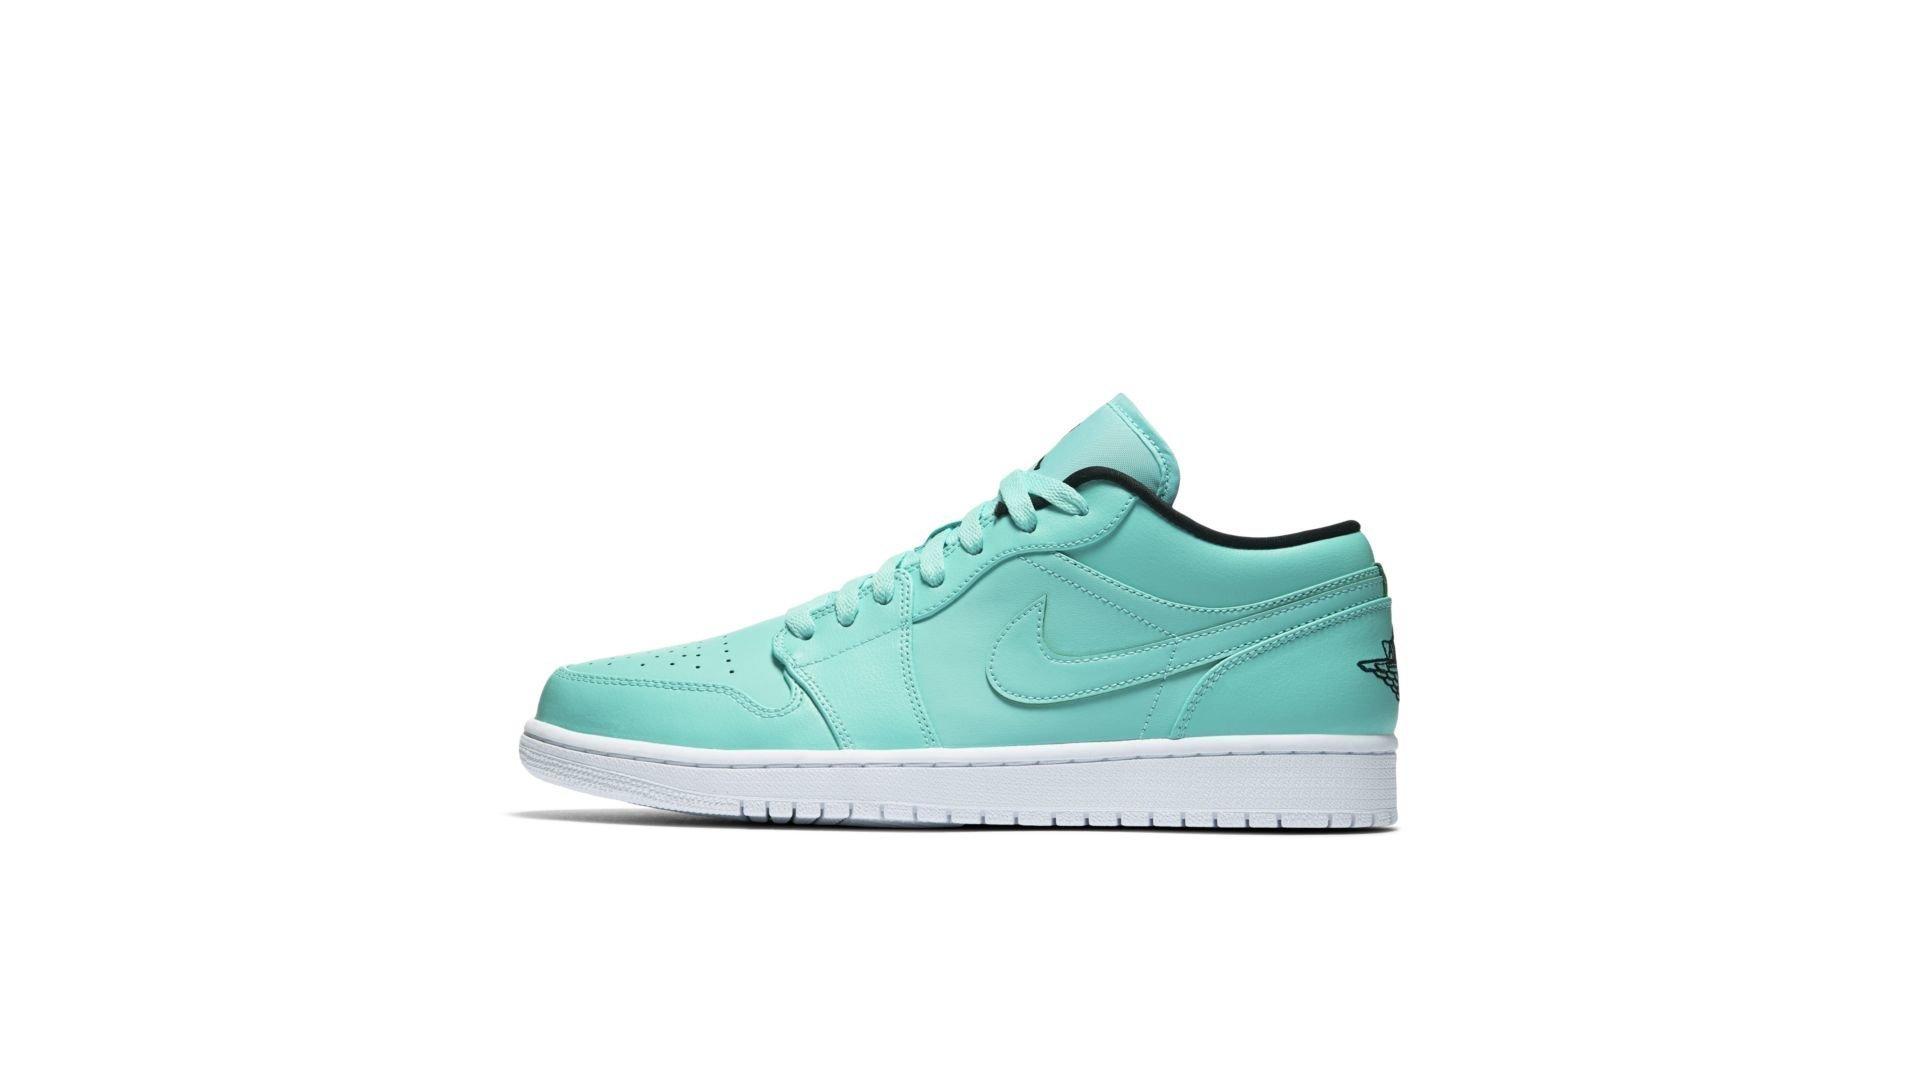 Jordan 1 Low Hyper Turquoise (553558-304)